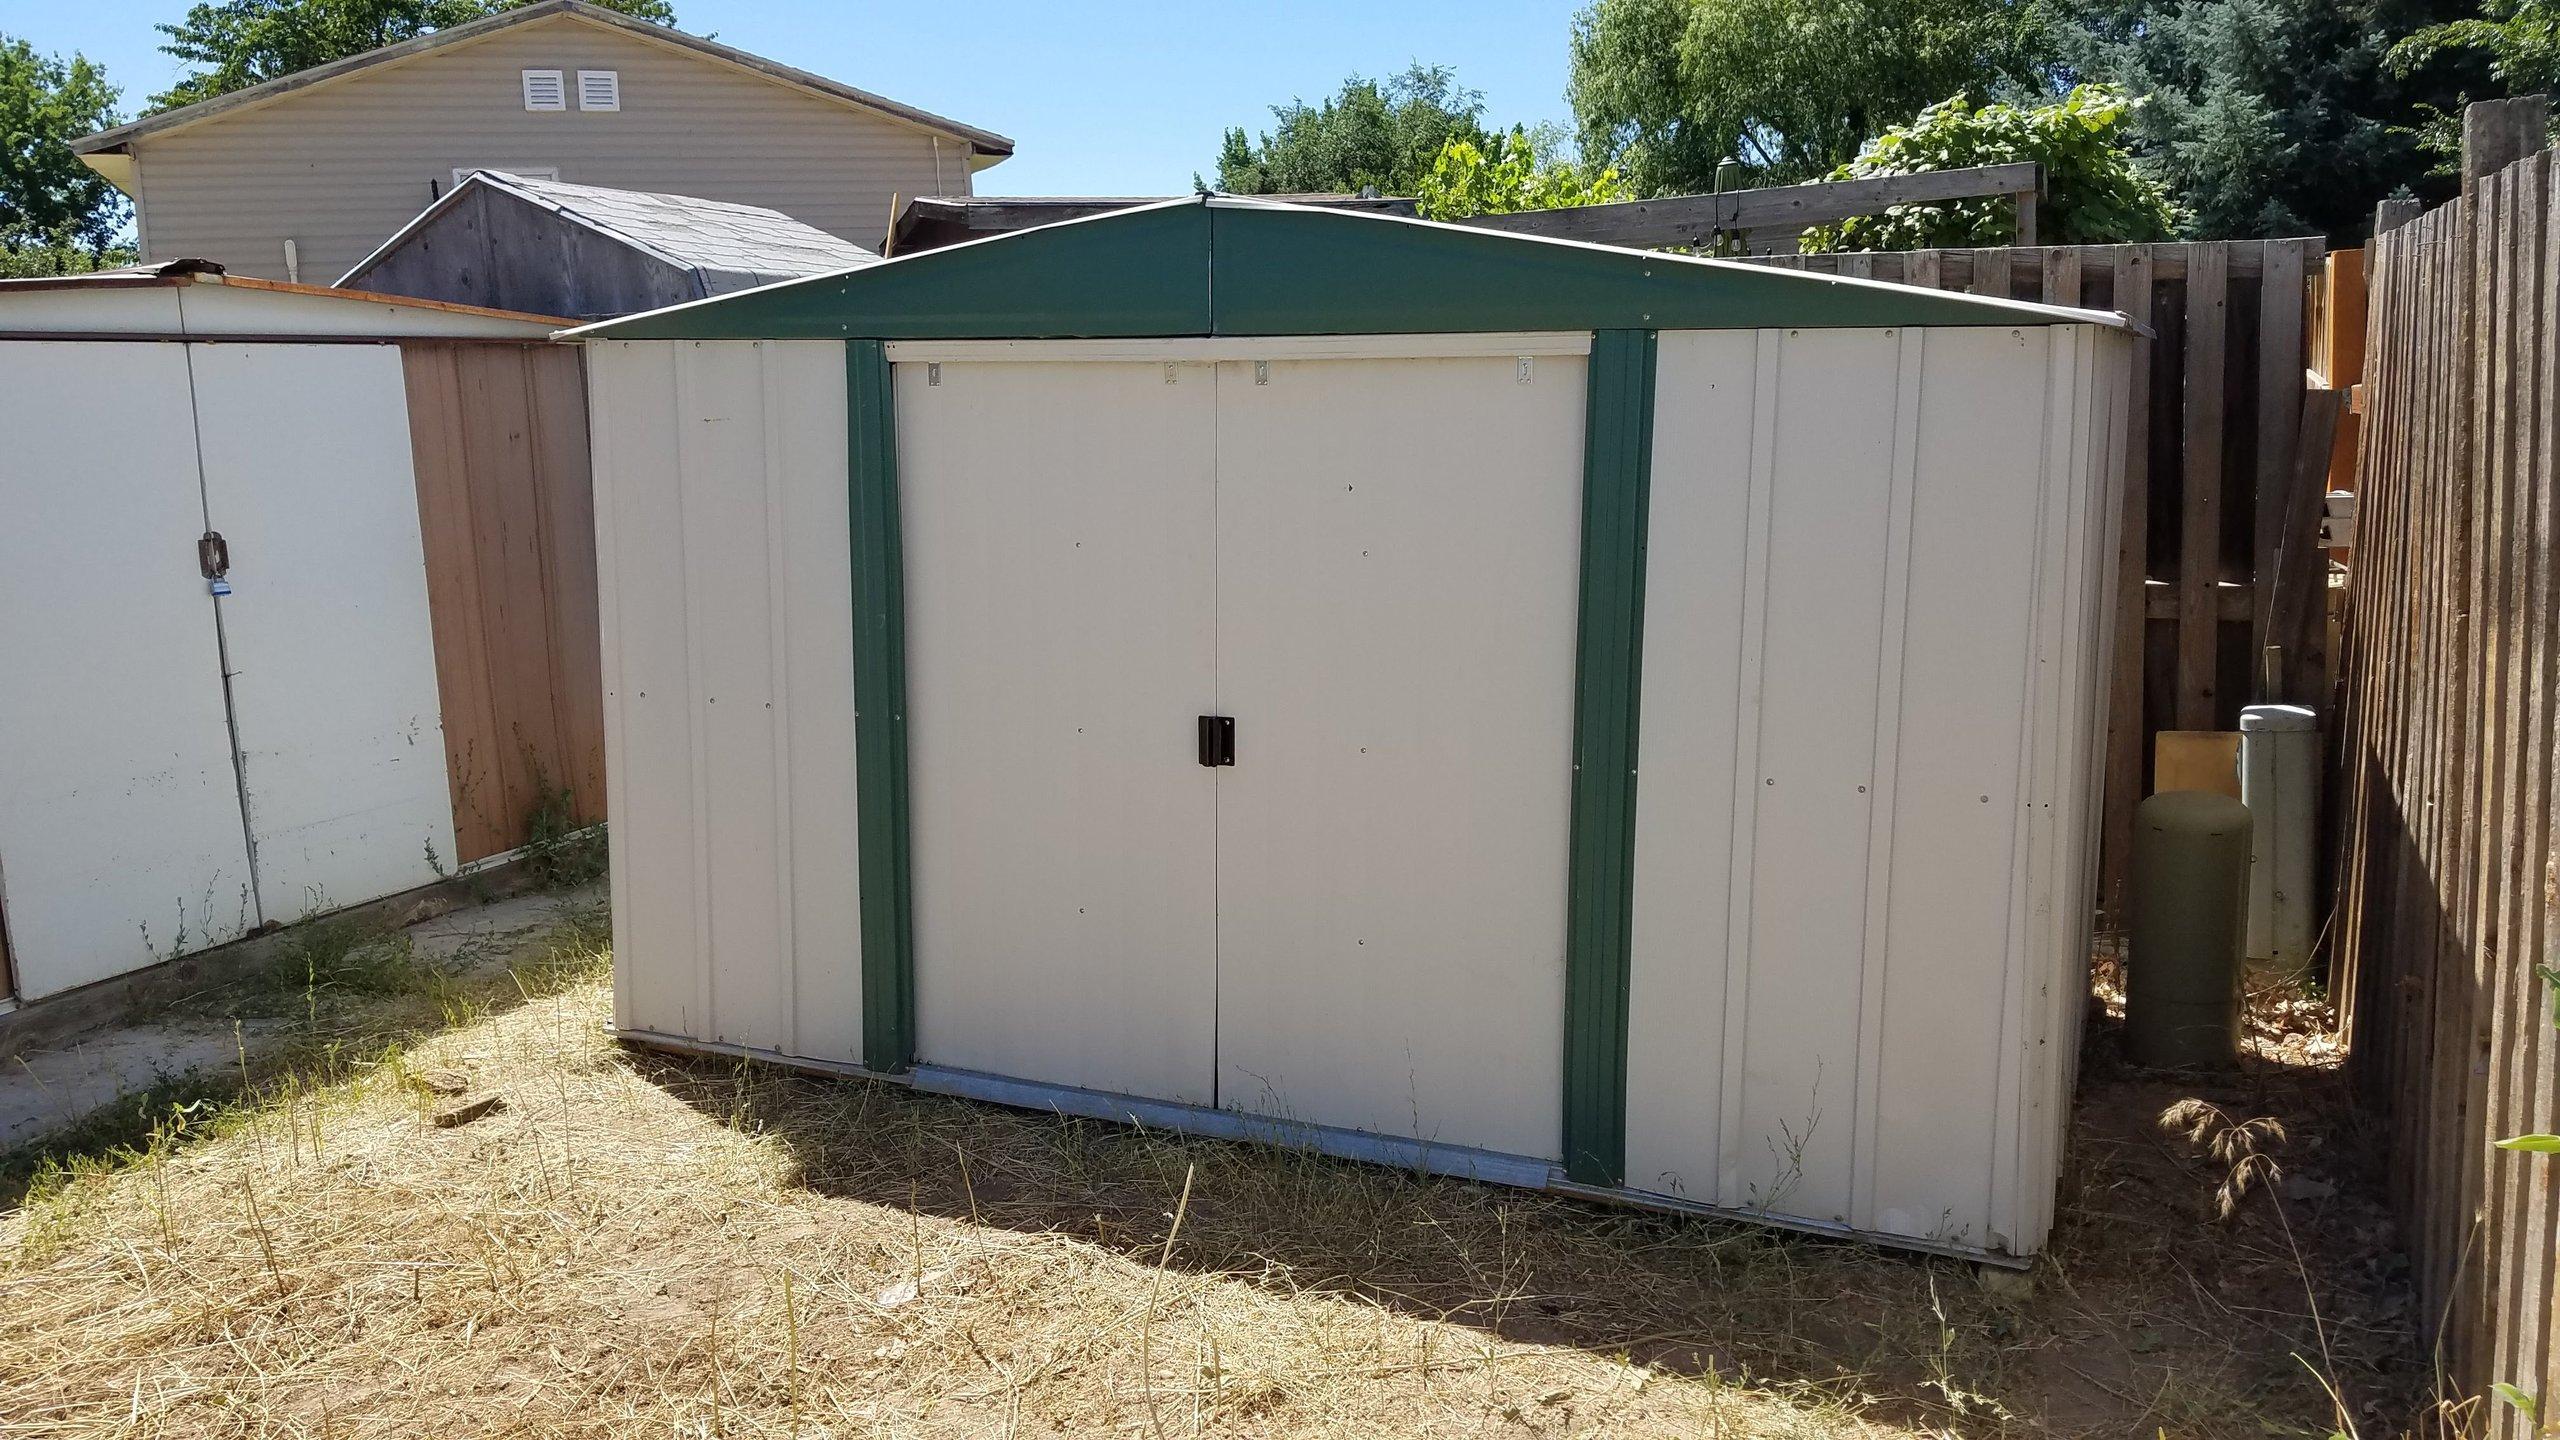 9x5 Shed self storage unit